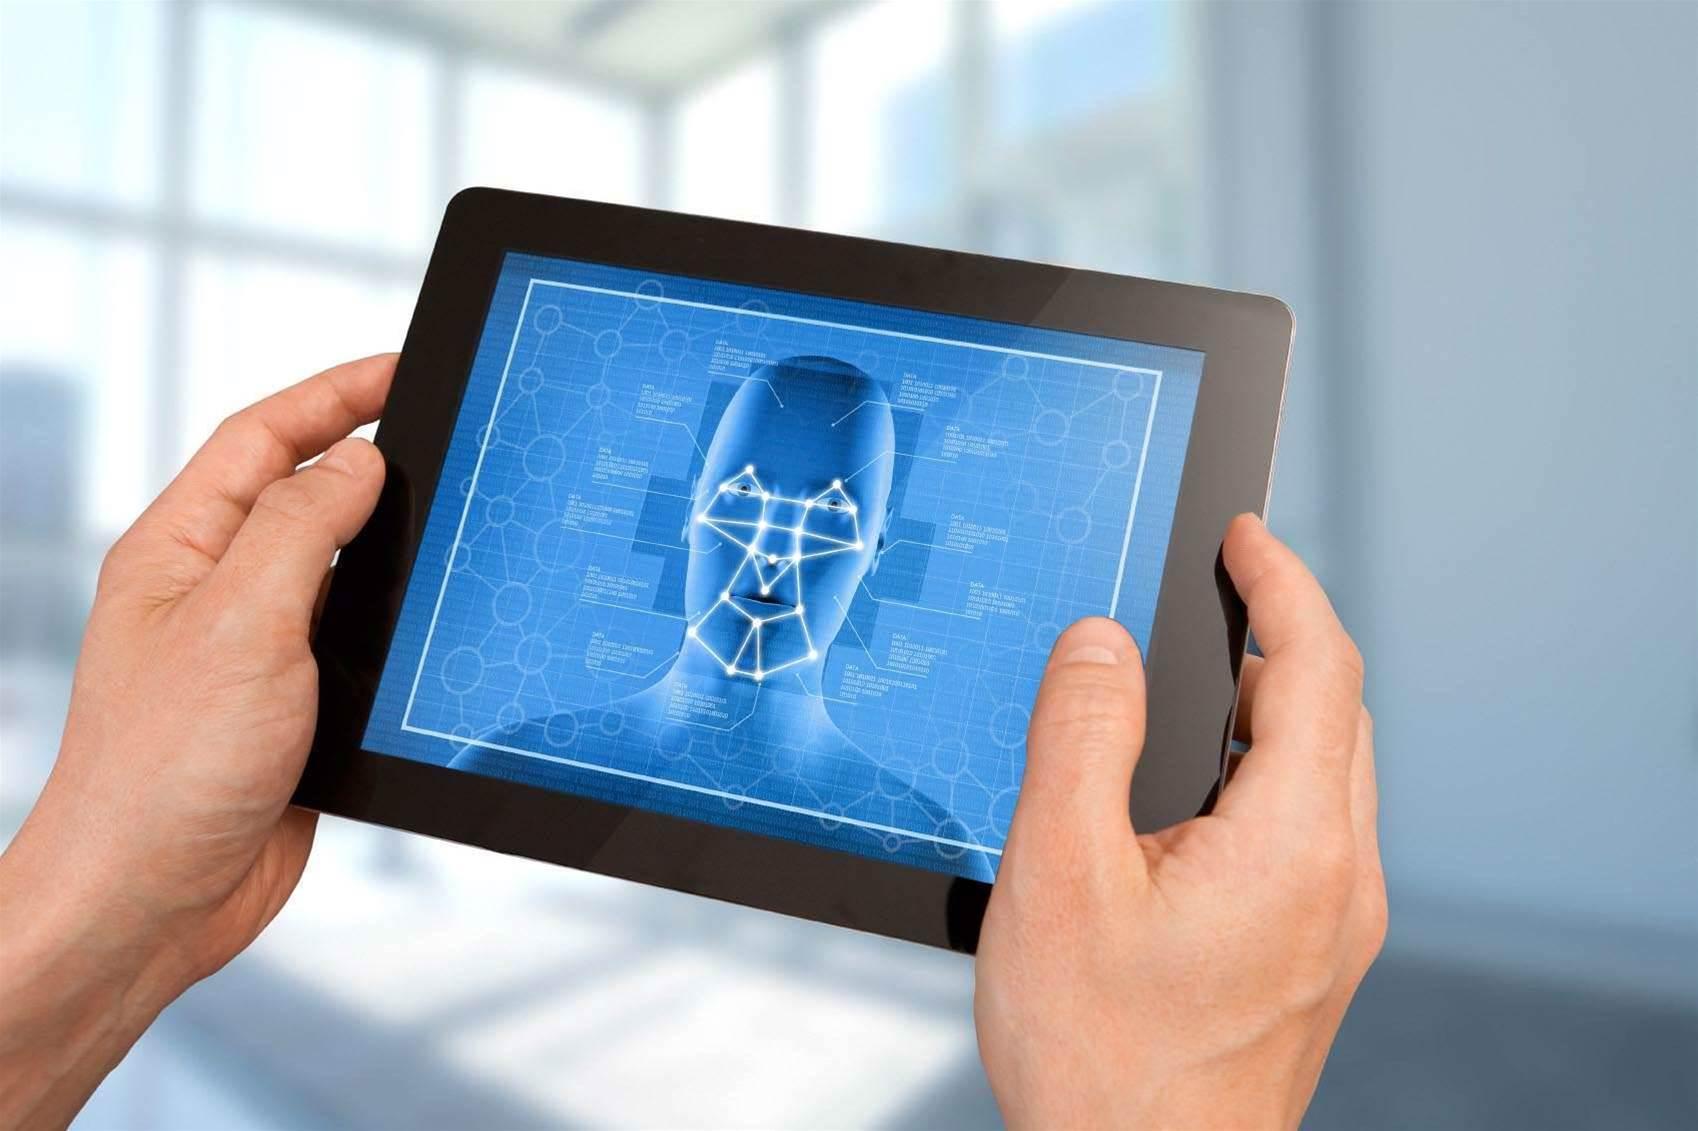 Swiss companies plan single online identity